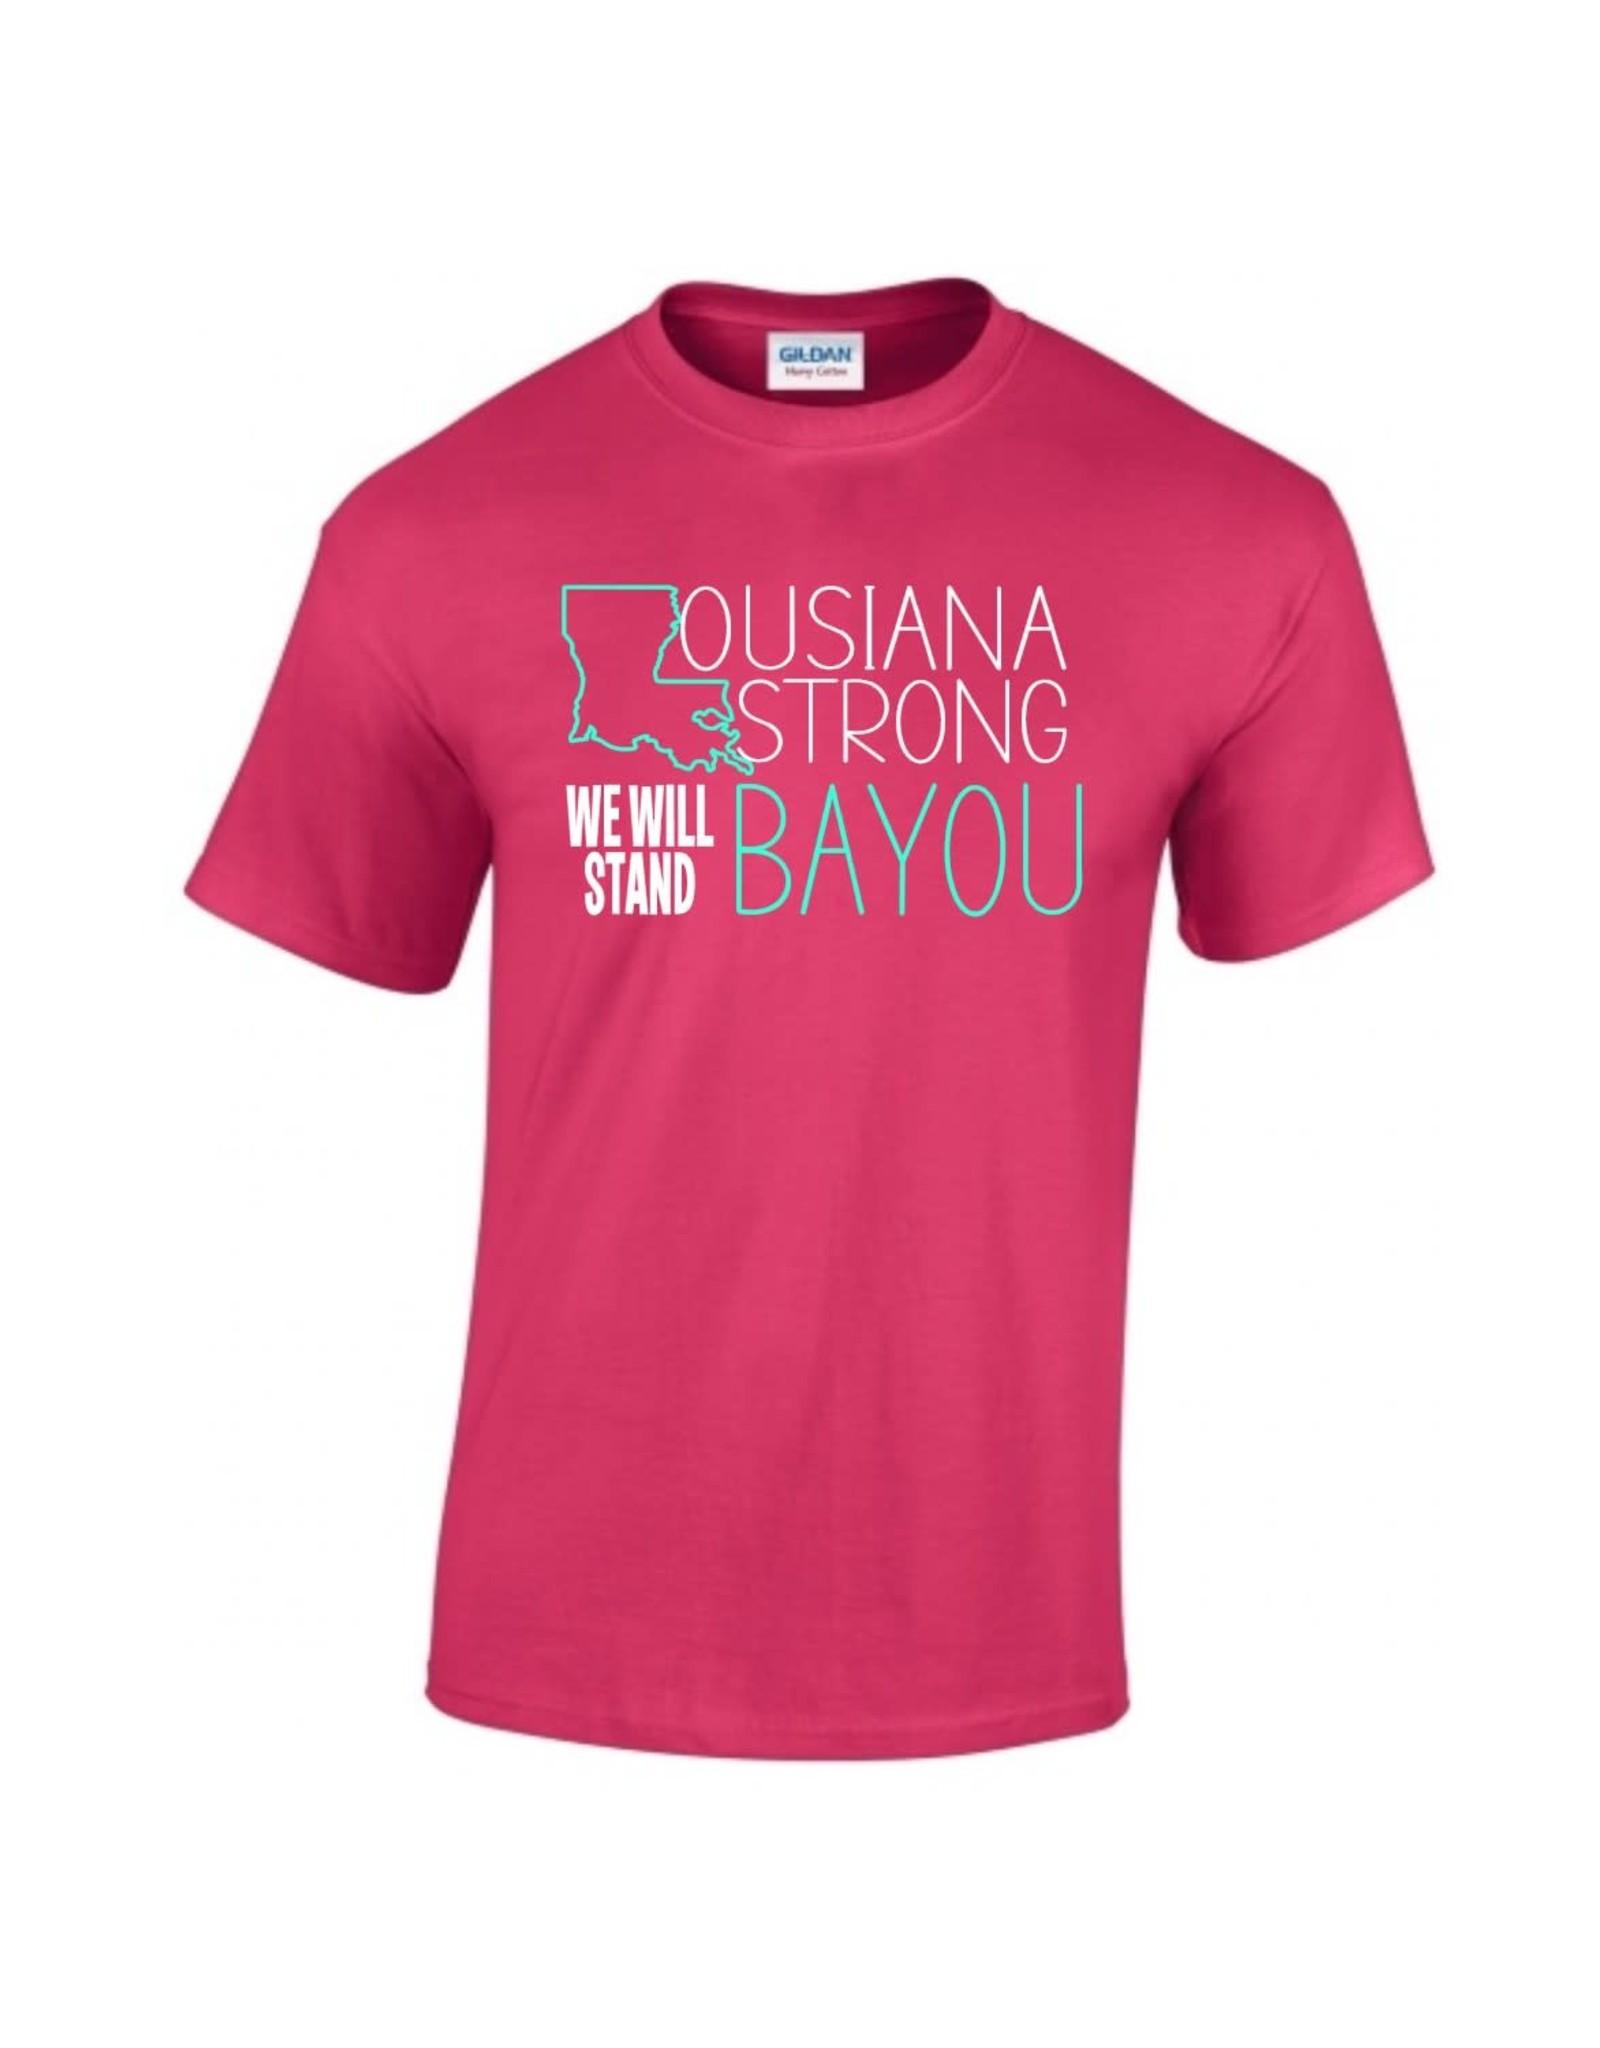 LA Strong Bayou (Pink)